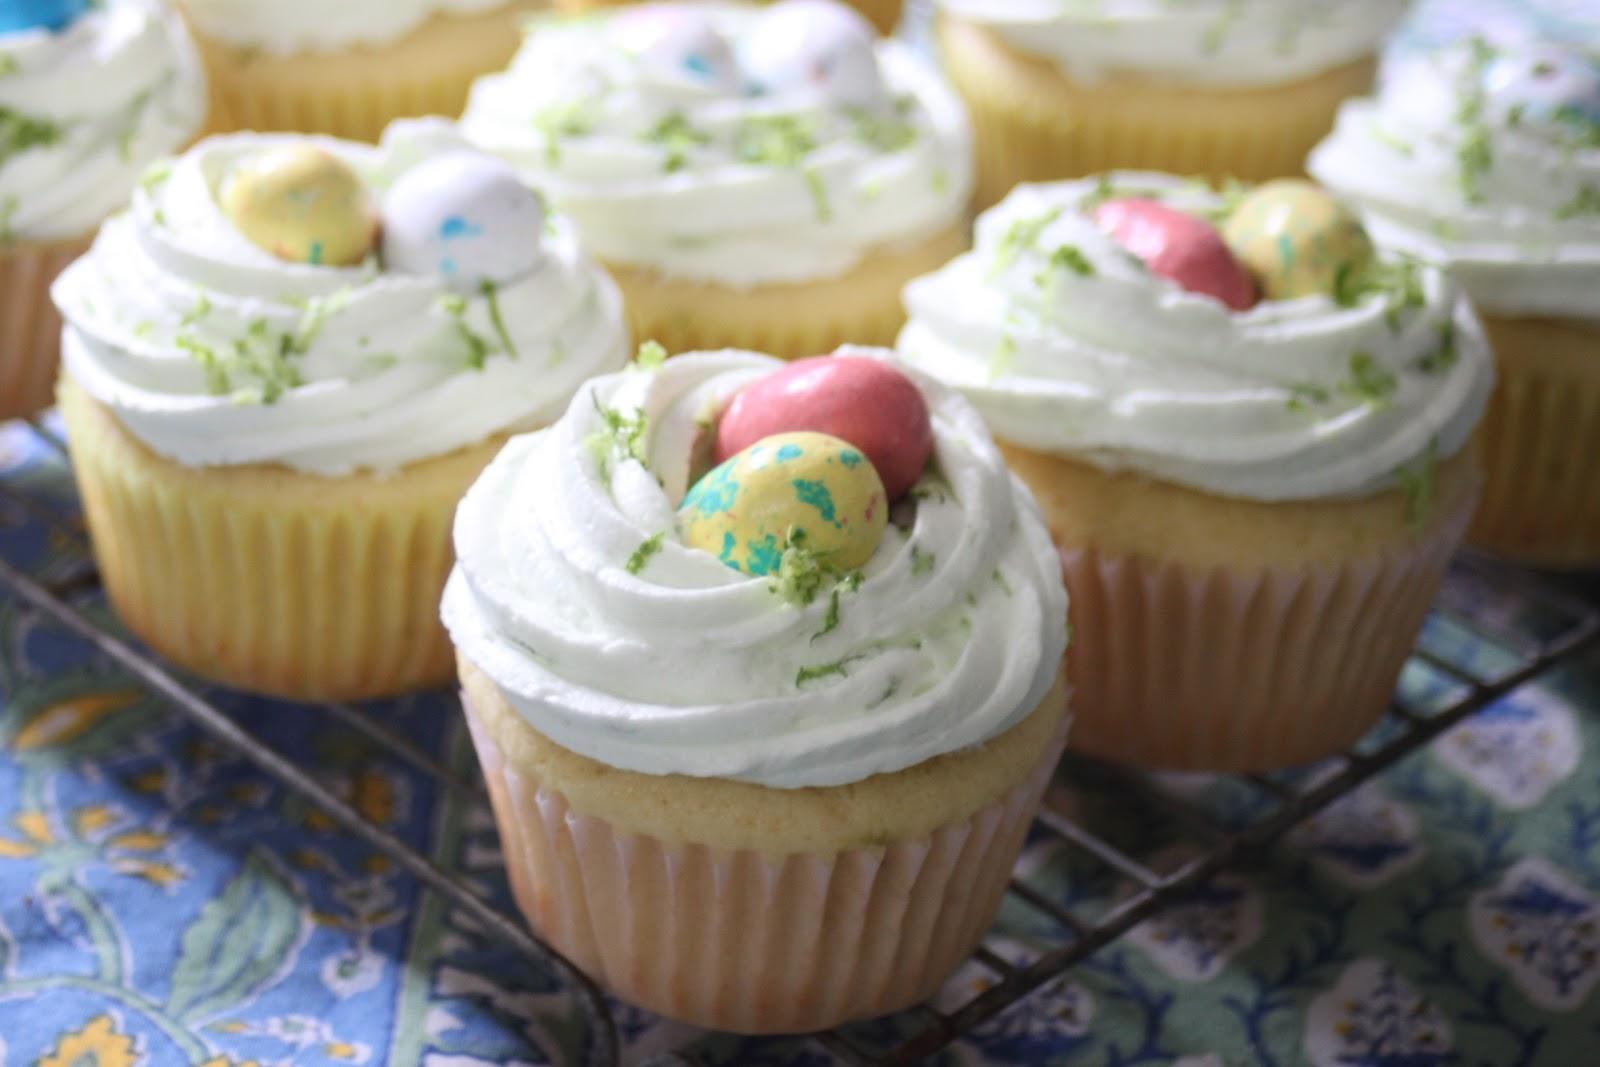 Good Clean Fun: Margarita Cupcakes